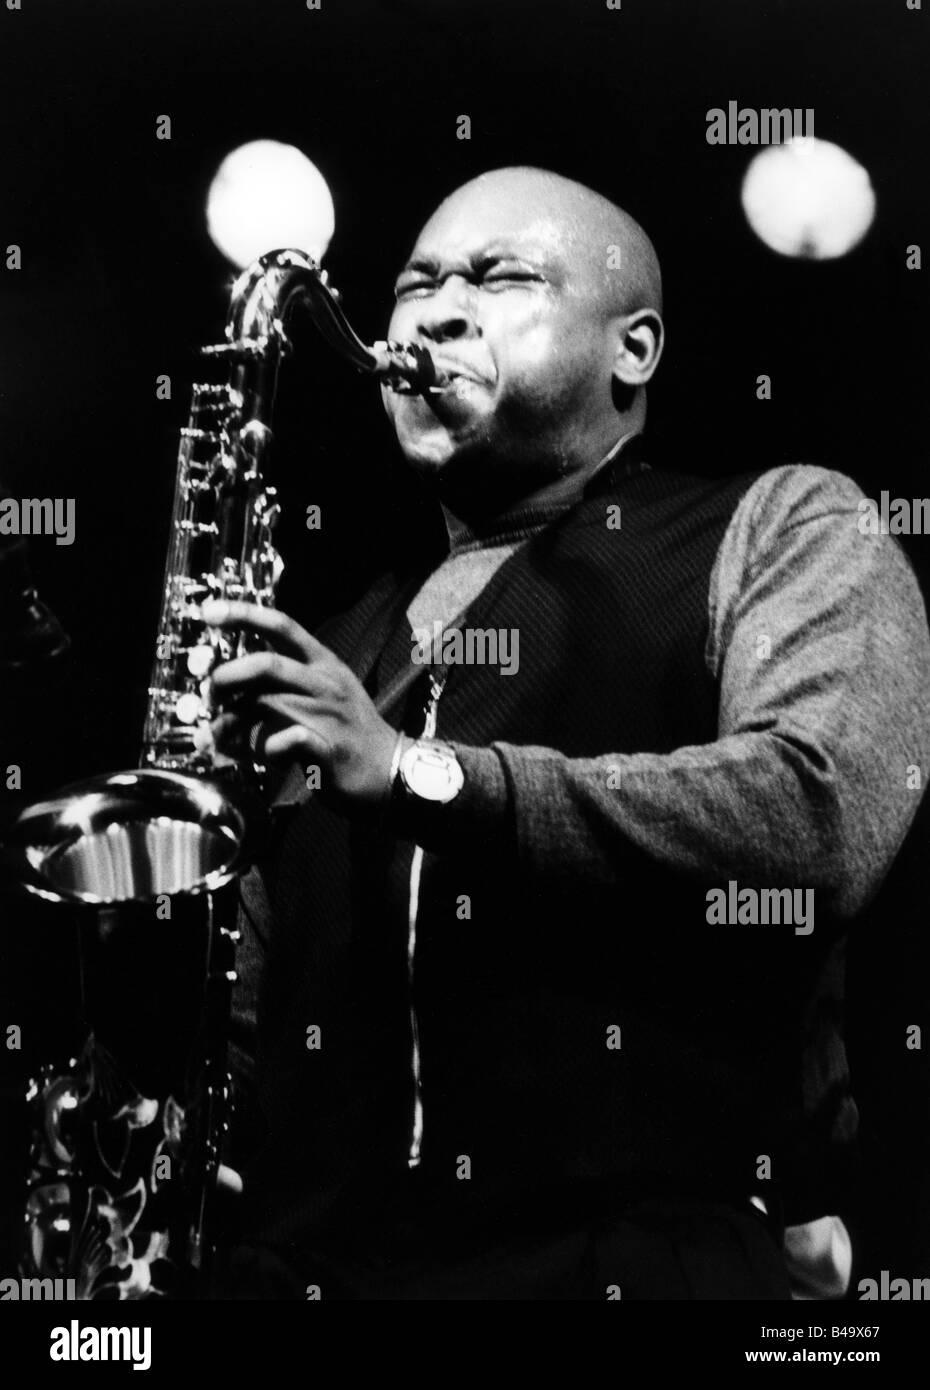 Burton, Abraham, American musician (Jazz), half length, with tenorsaxophone, live performance, Mannheim, March 1998, - Stock Image